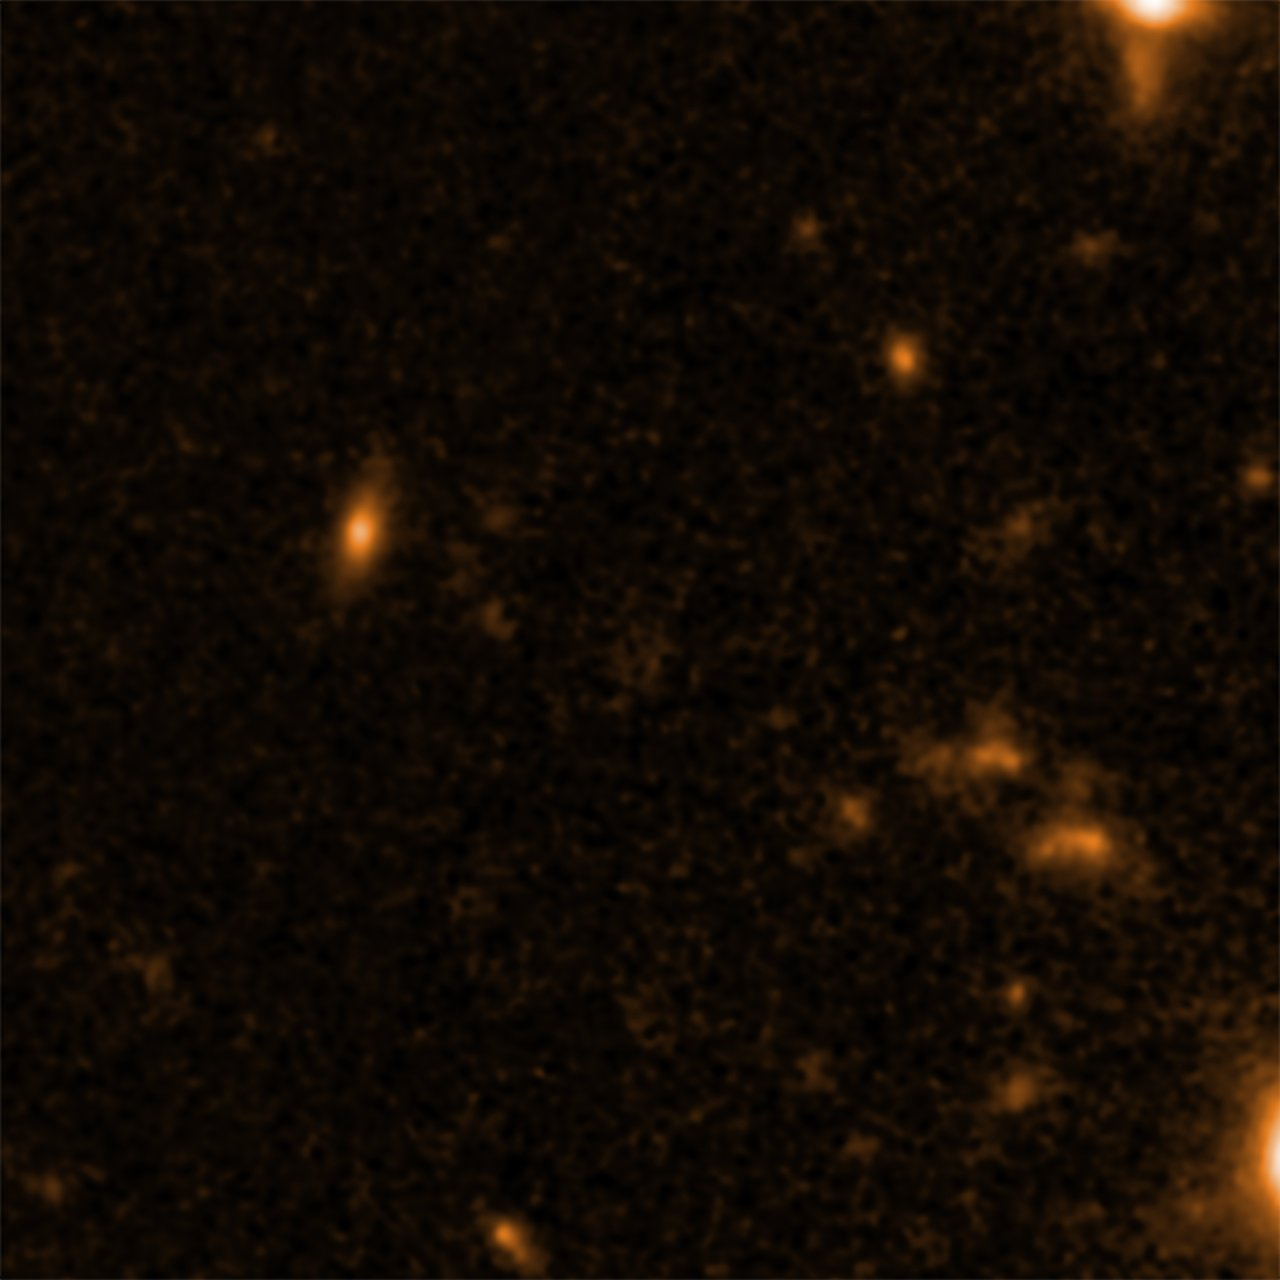 Supermassive black hole seed seen by Hubble | ESA/Hubble